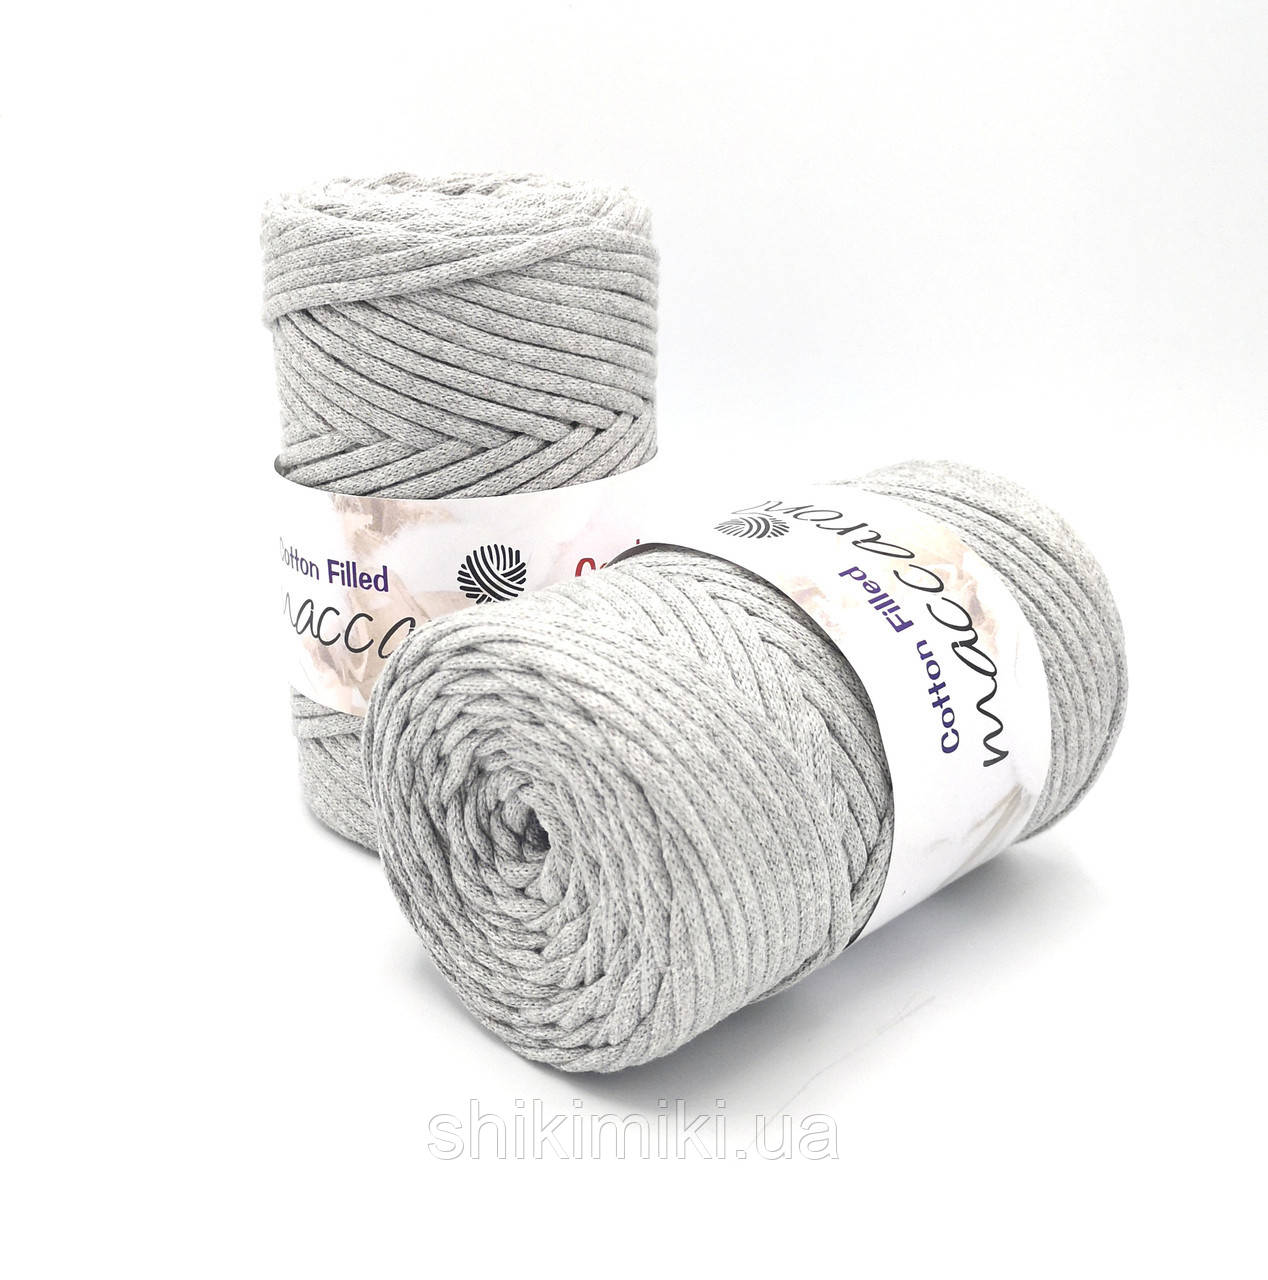 Трикотажный хлопковый шнур Cotton Filled 5 мм, цвет Серый меланж